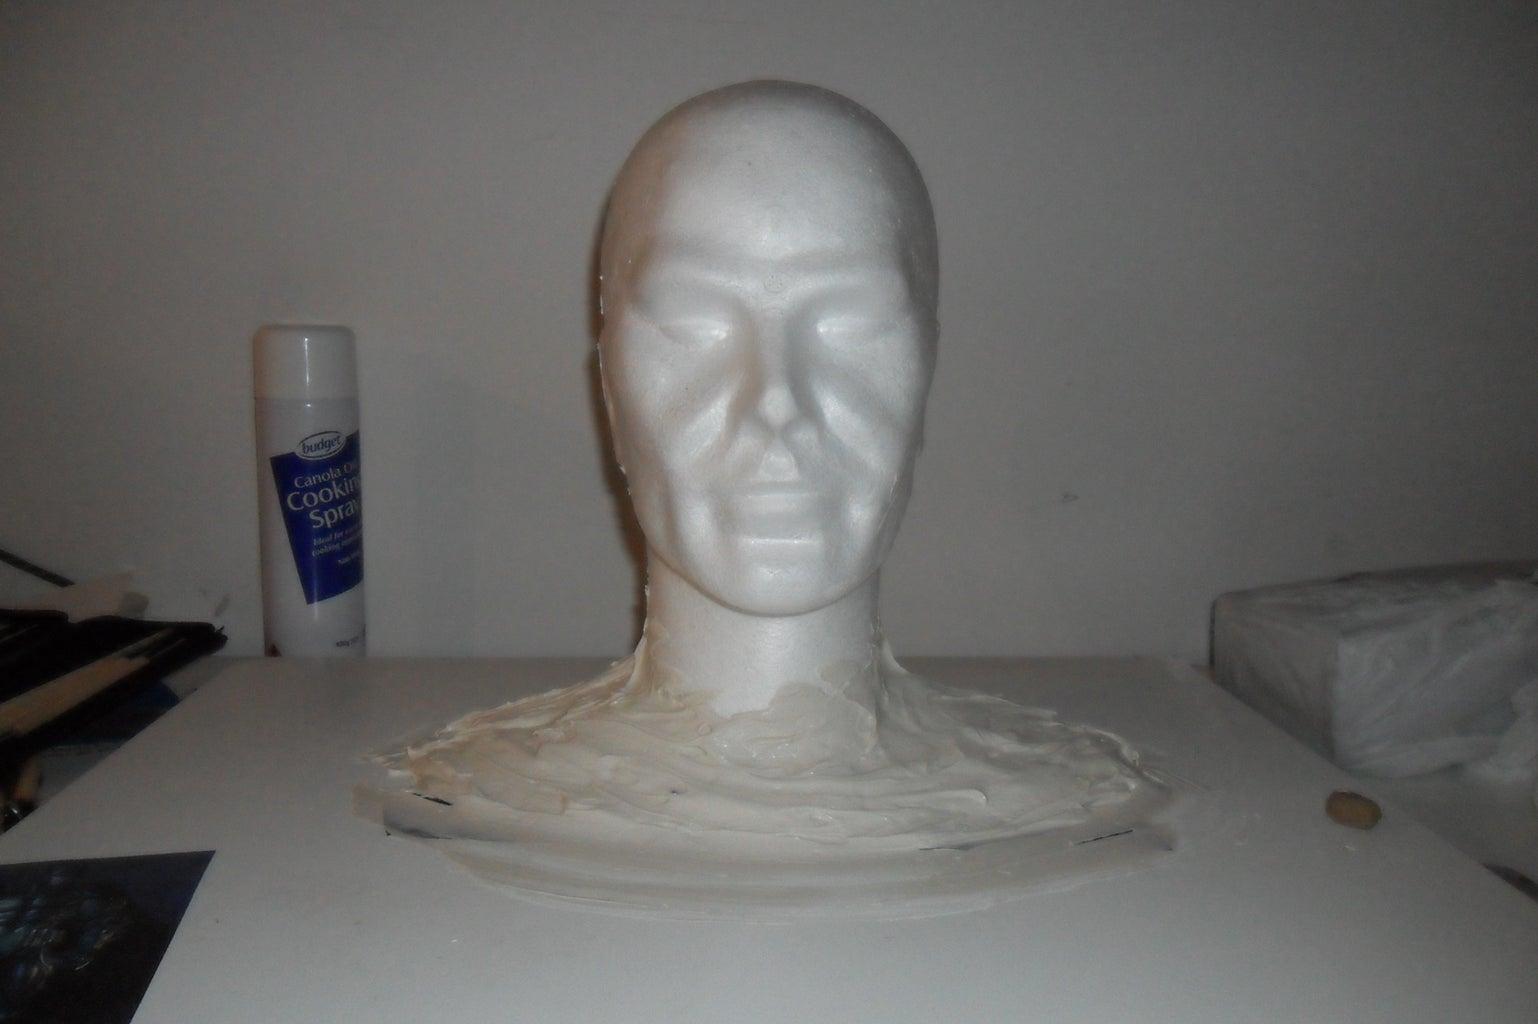 Starting the Sculpt